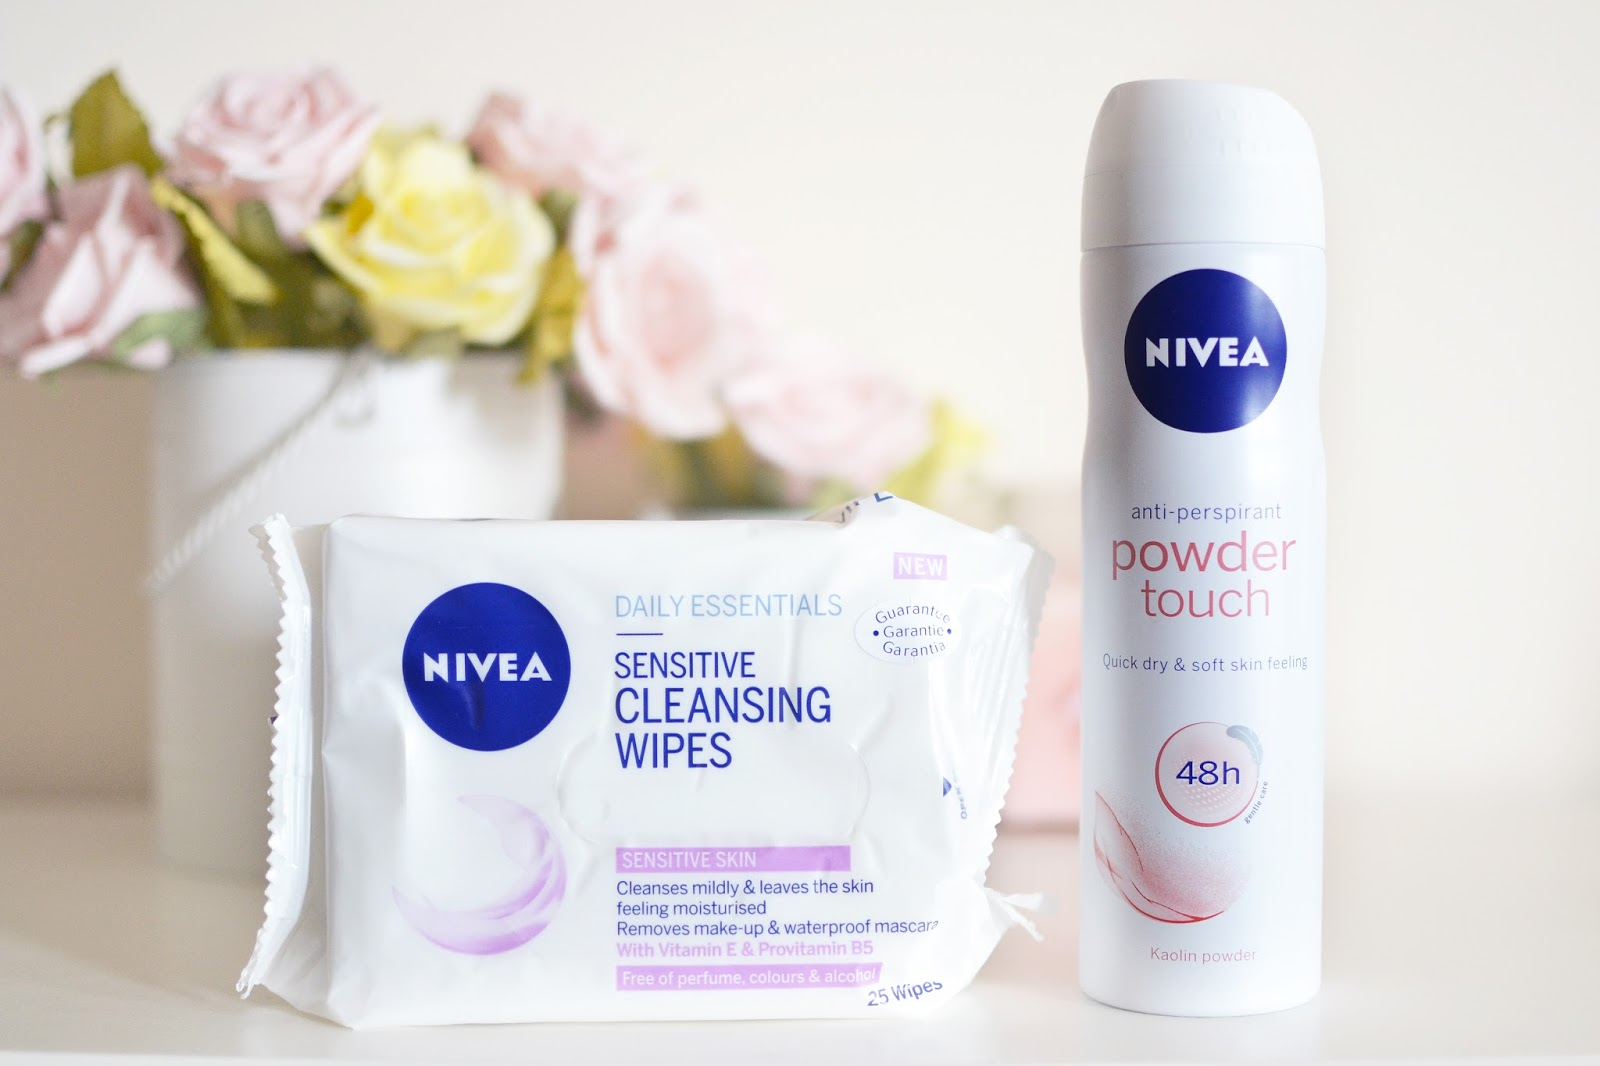 nivea products, nivea beauty products